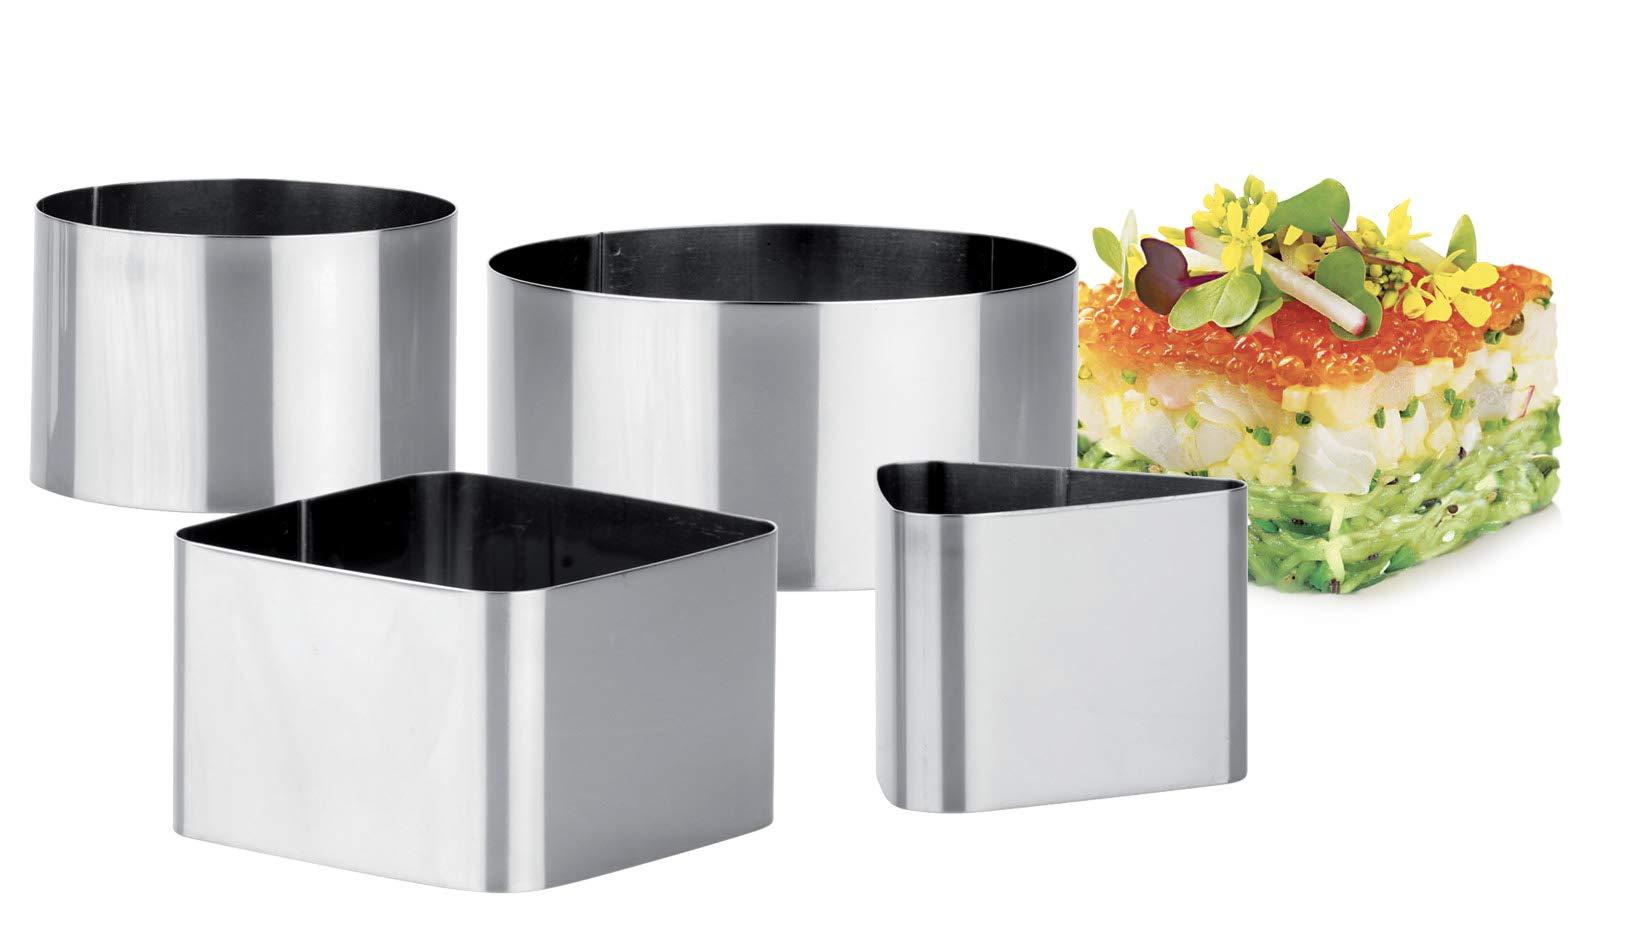 Tescoma 428262 - Juego de 4 moldes Emplatar Chef product image